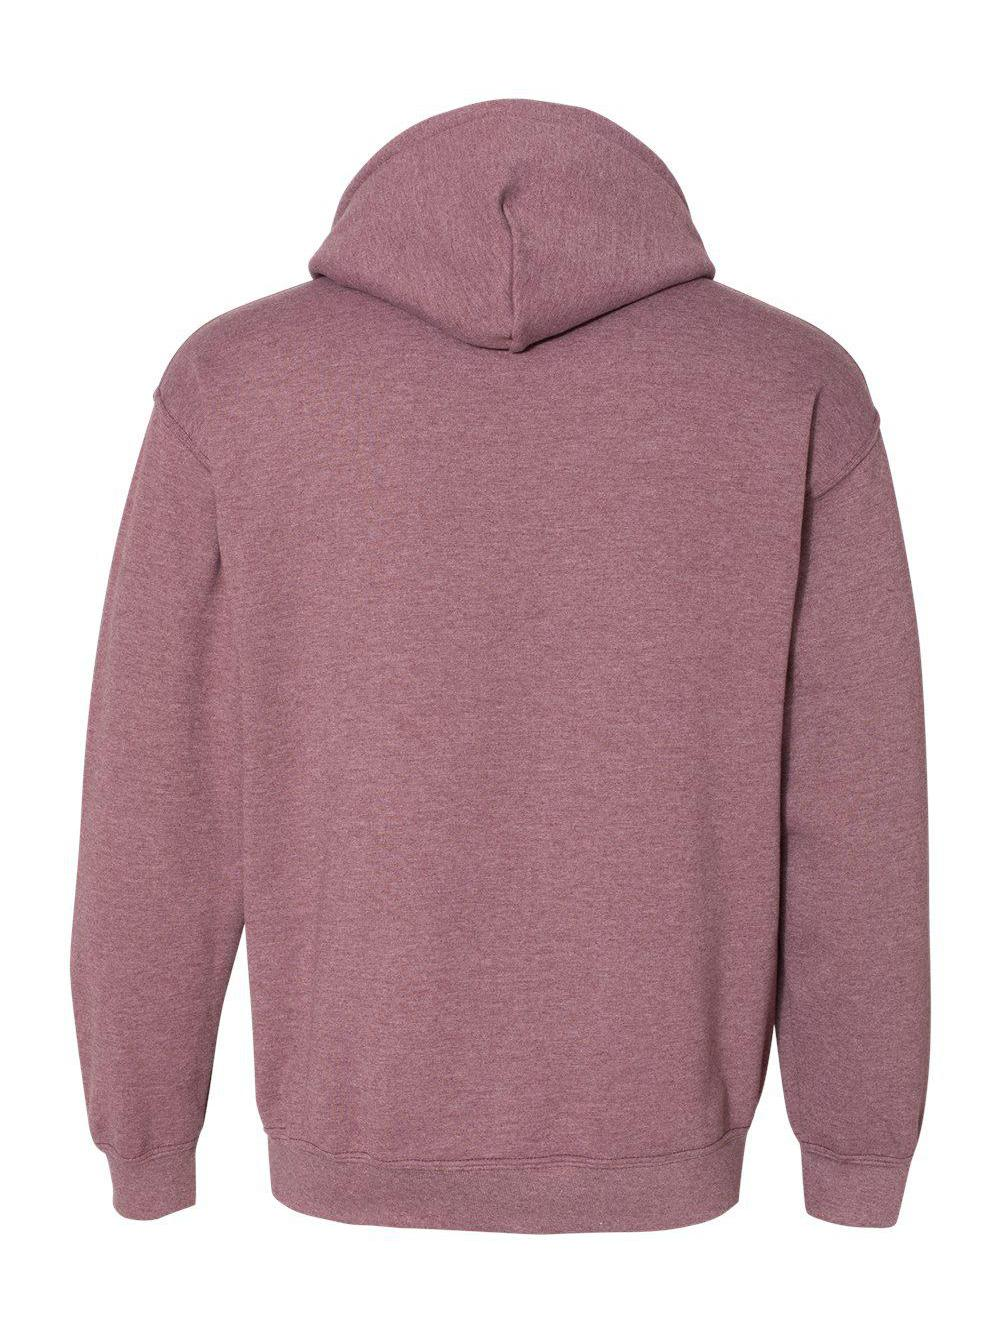 Gildan-Heavy-Blend-Hooded-Sweatshirt-18500 miniatura 49